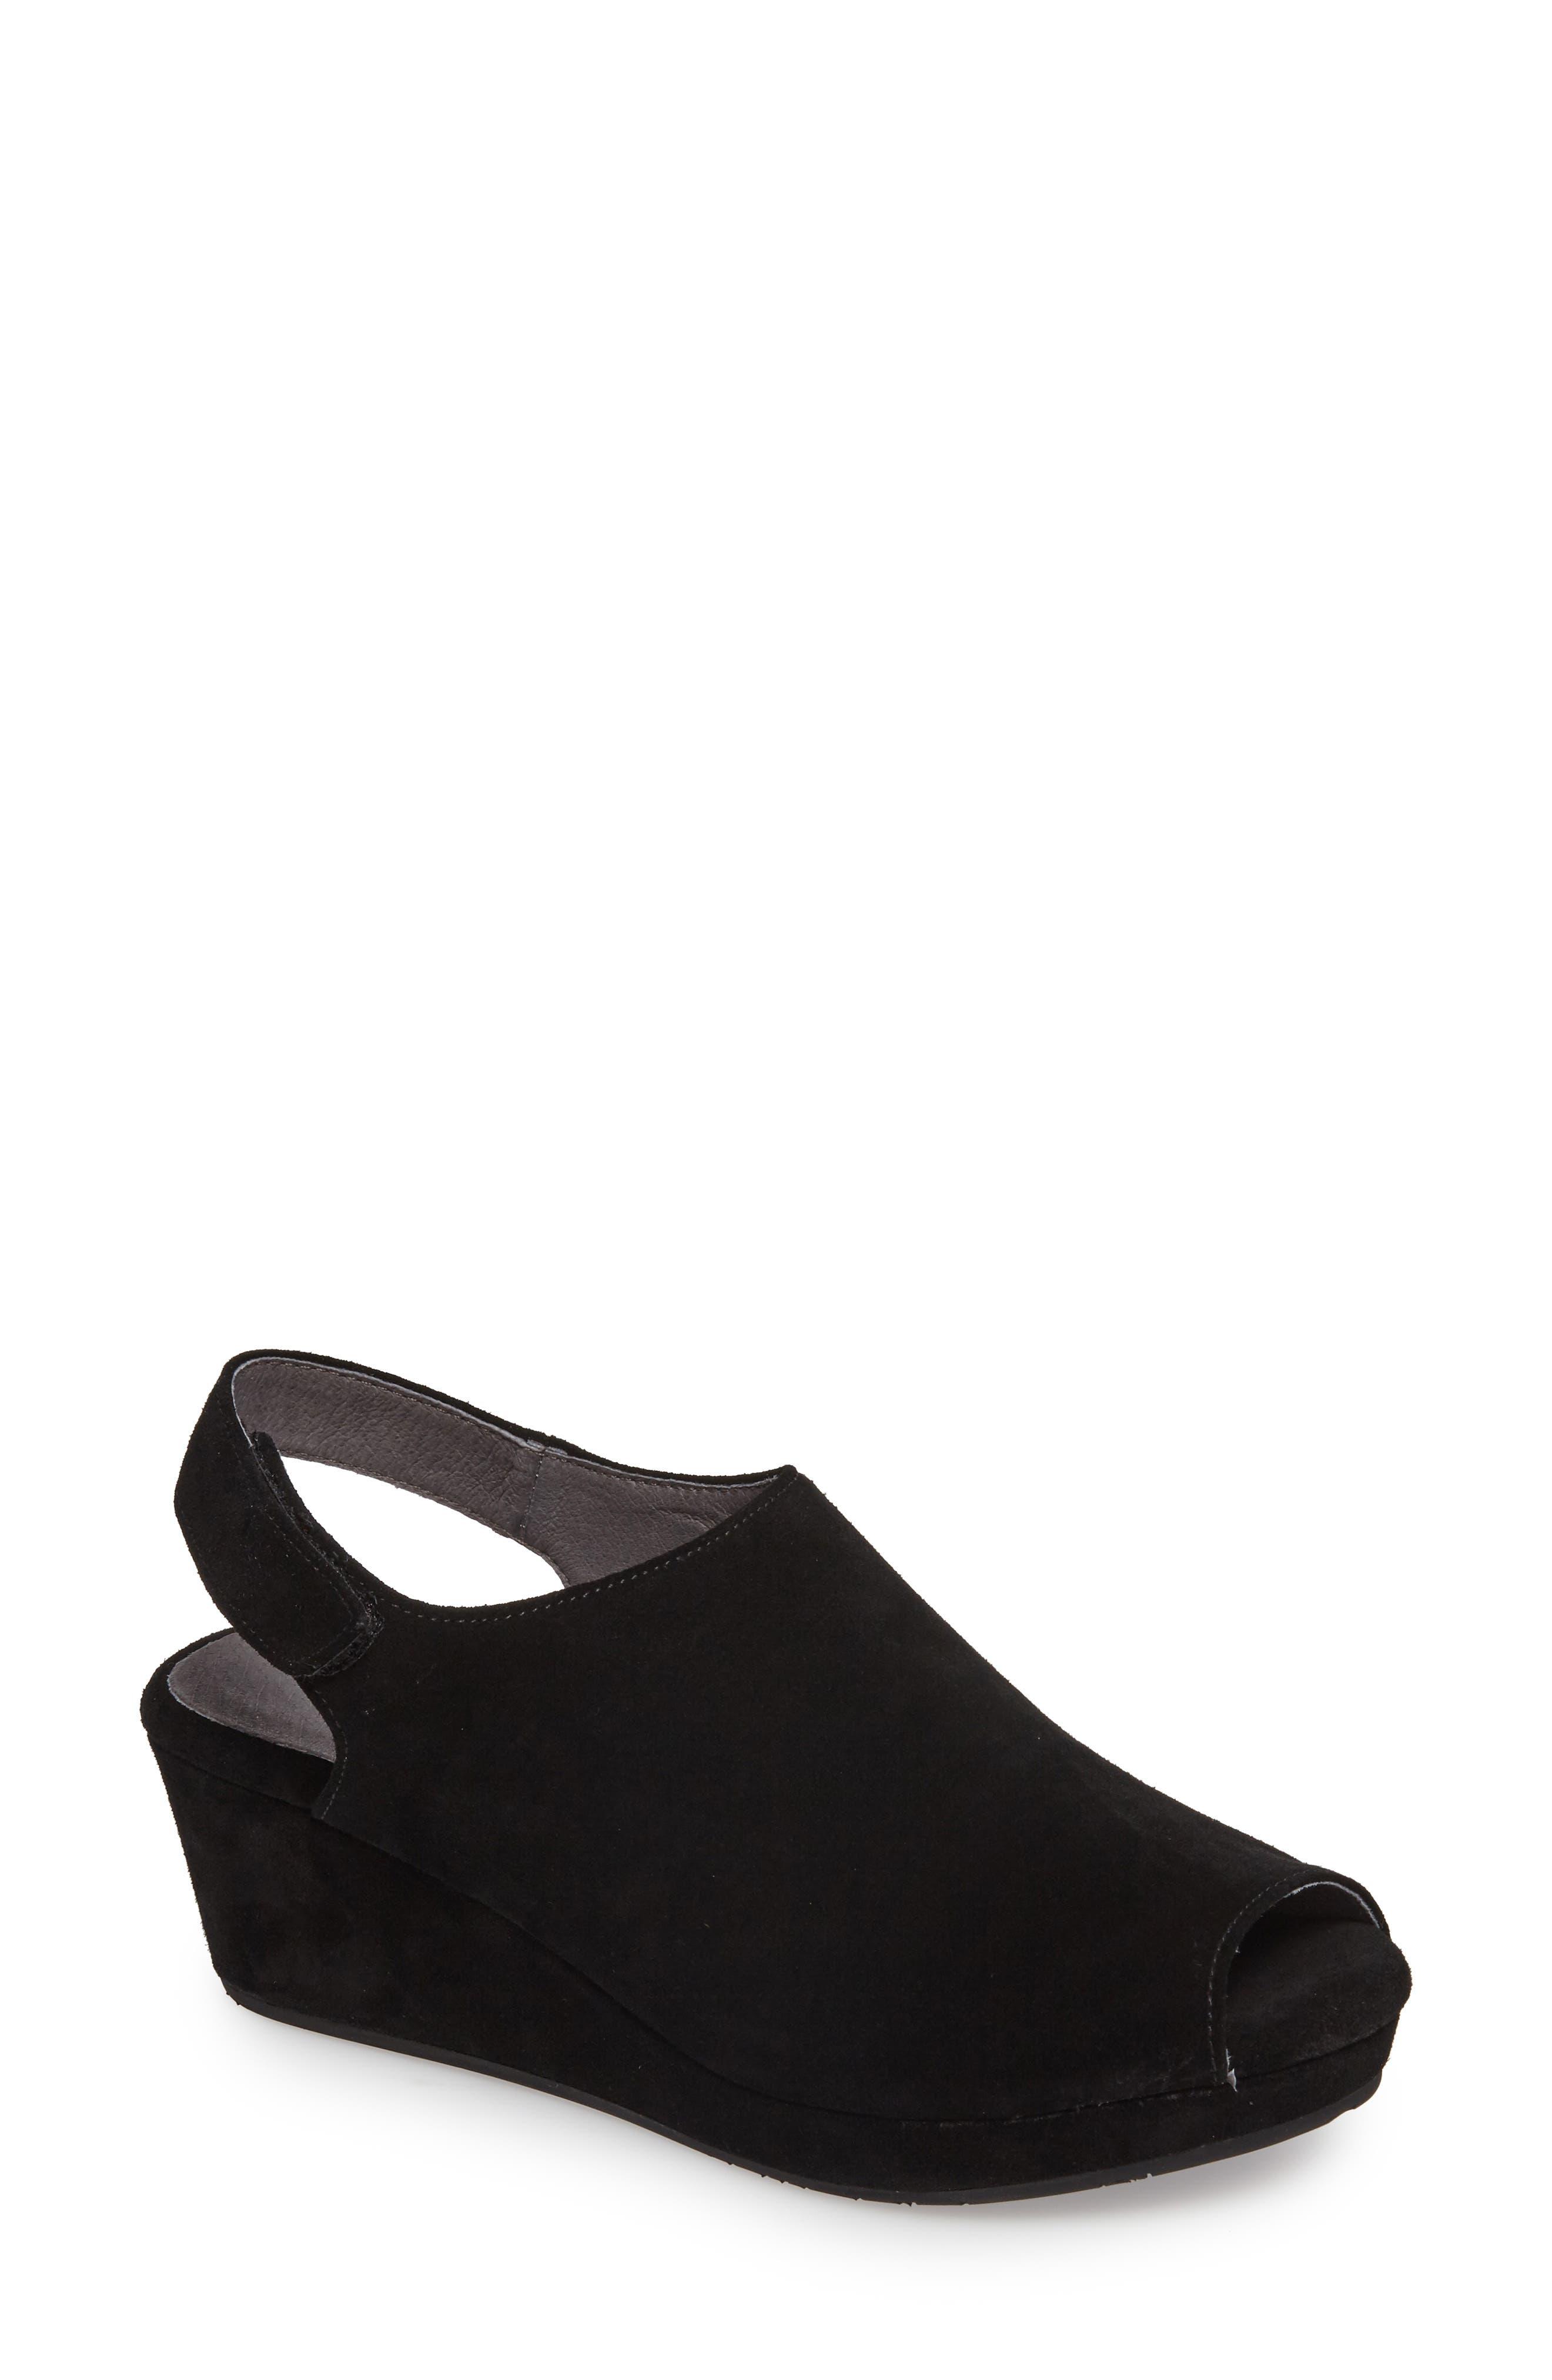 Yana Wedge Sandal,                         Main,                         color, BLACK SUEDE